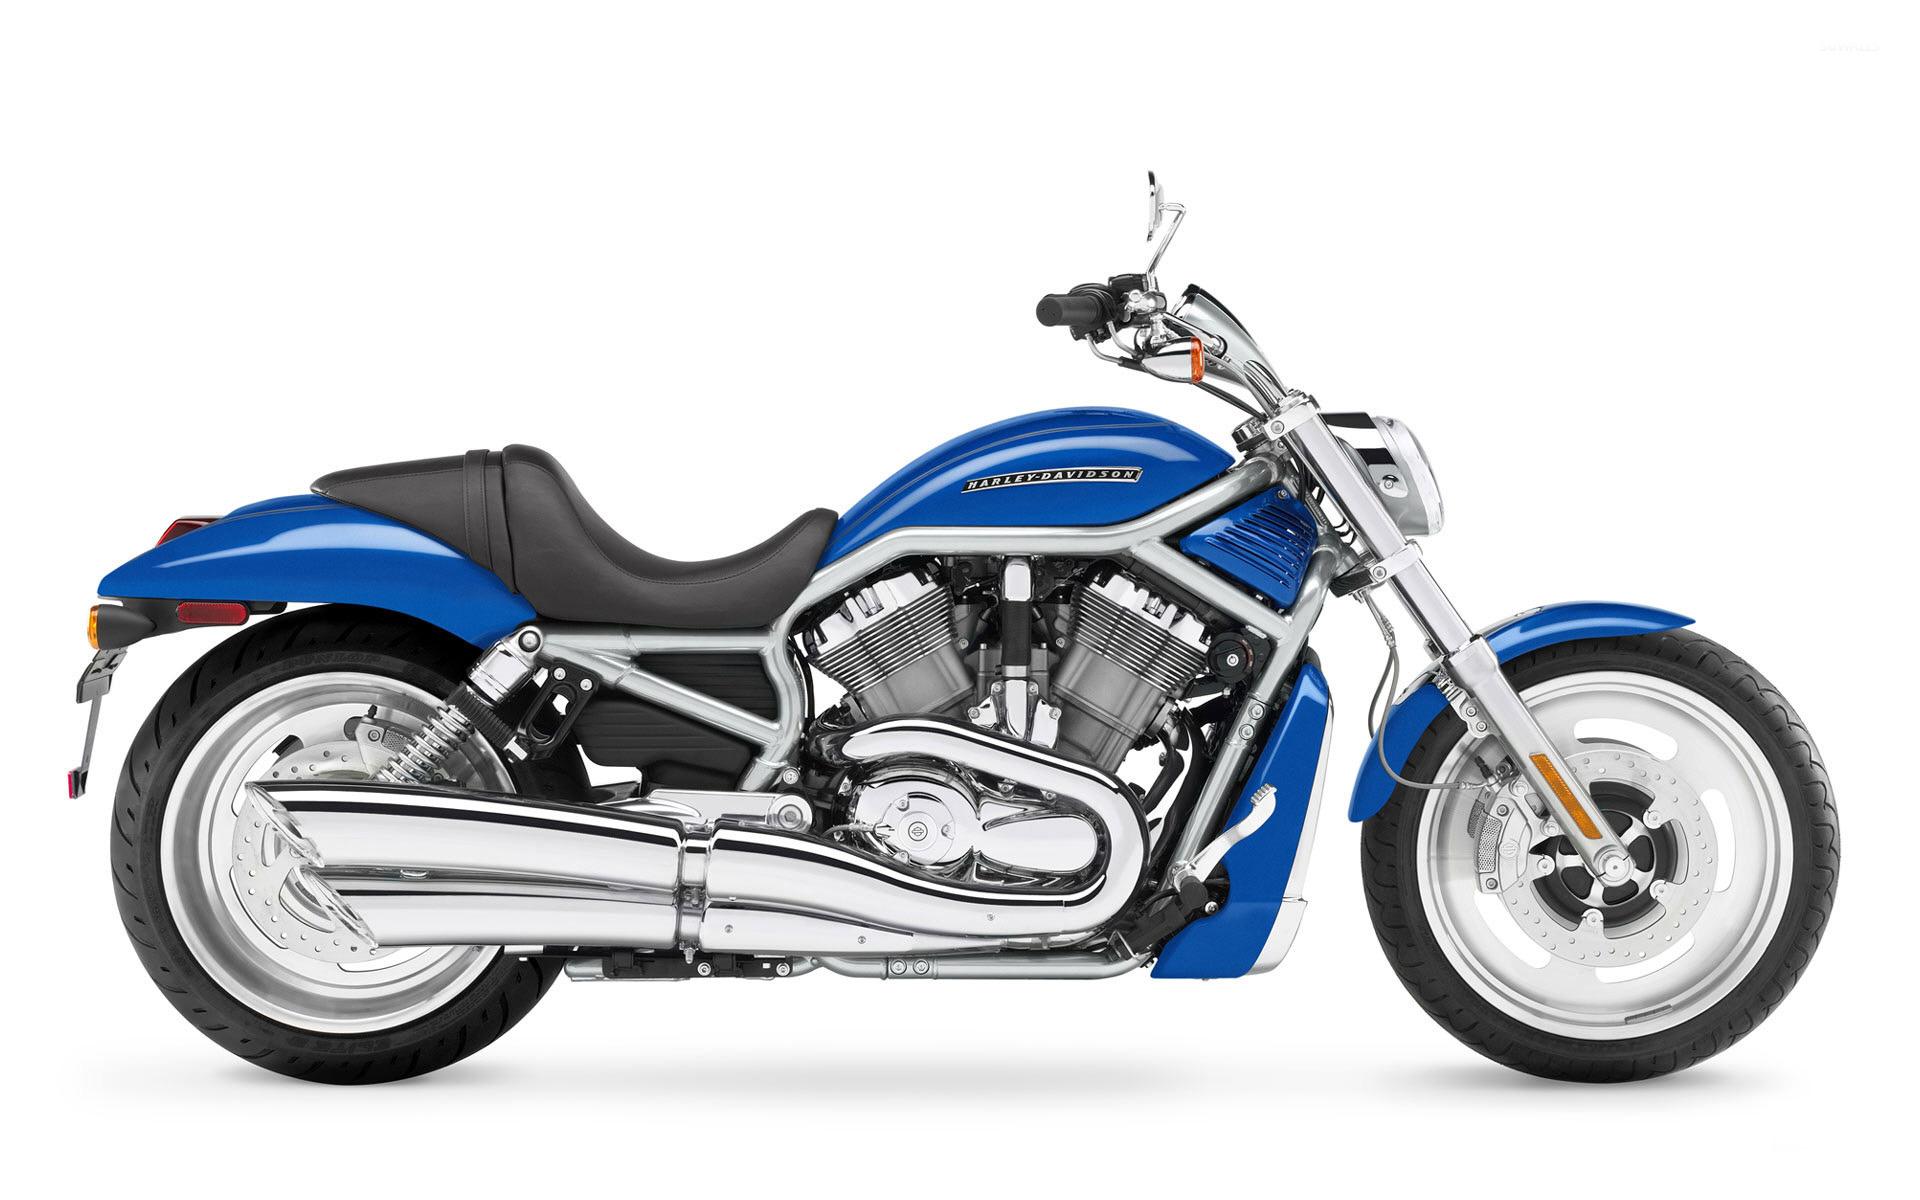 Davidson VRSCF V Rod Muscle wallpaper   Motorcycle wallpapers   9702 1920x1200